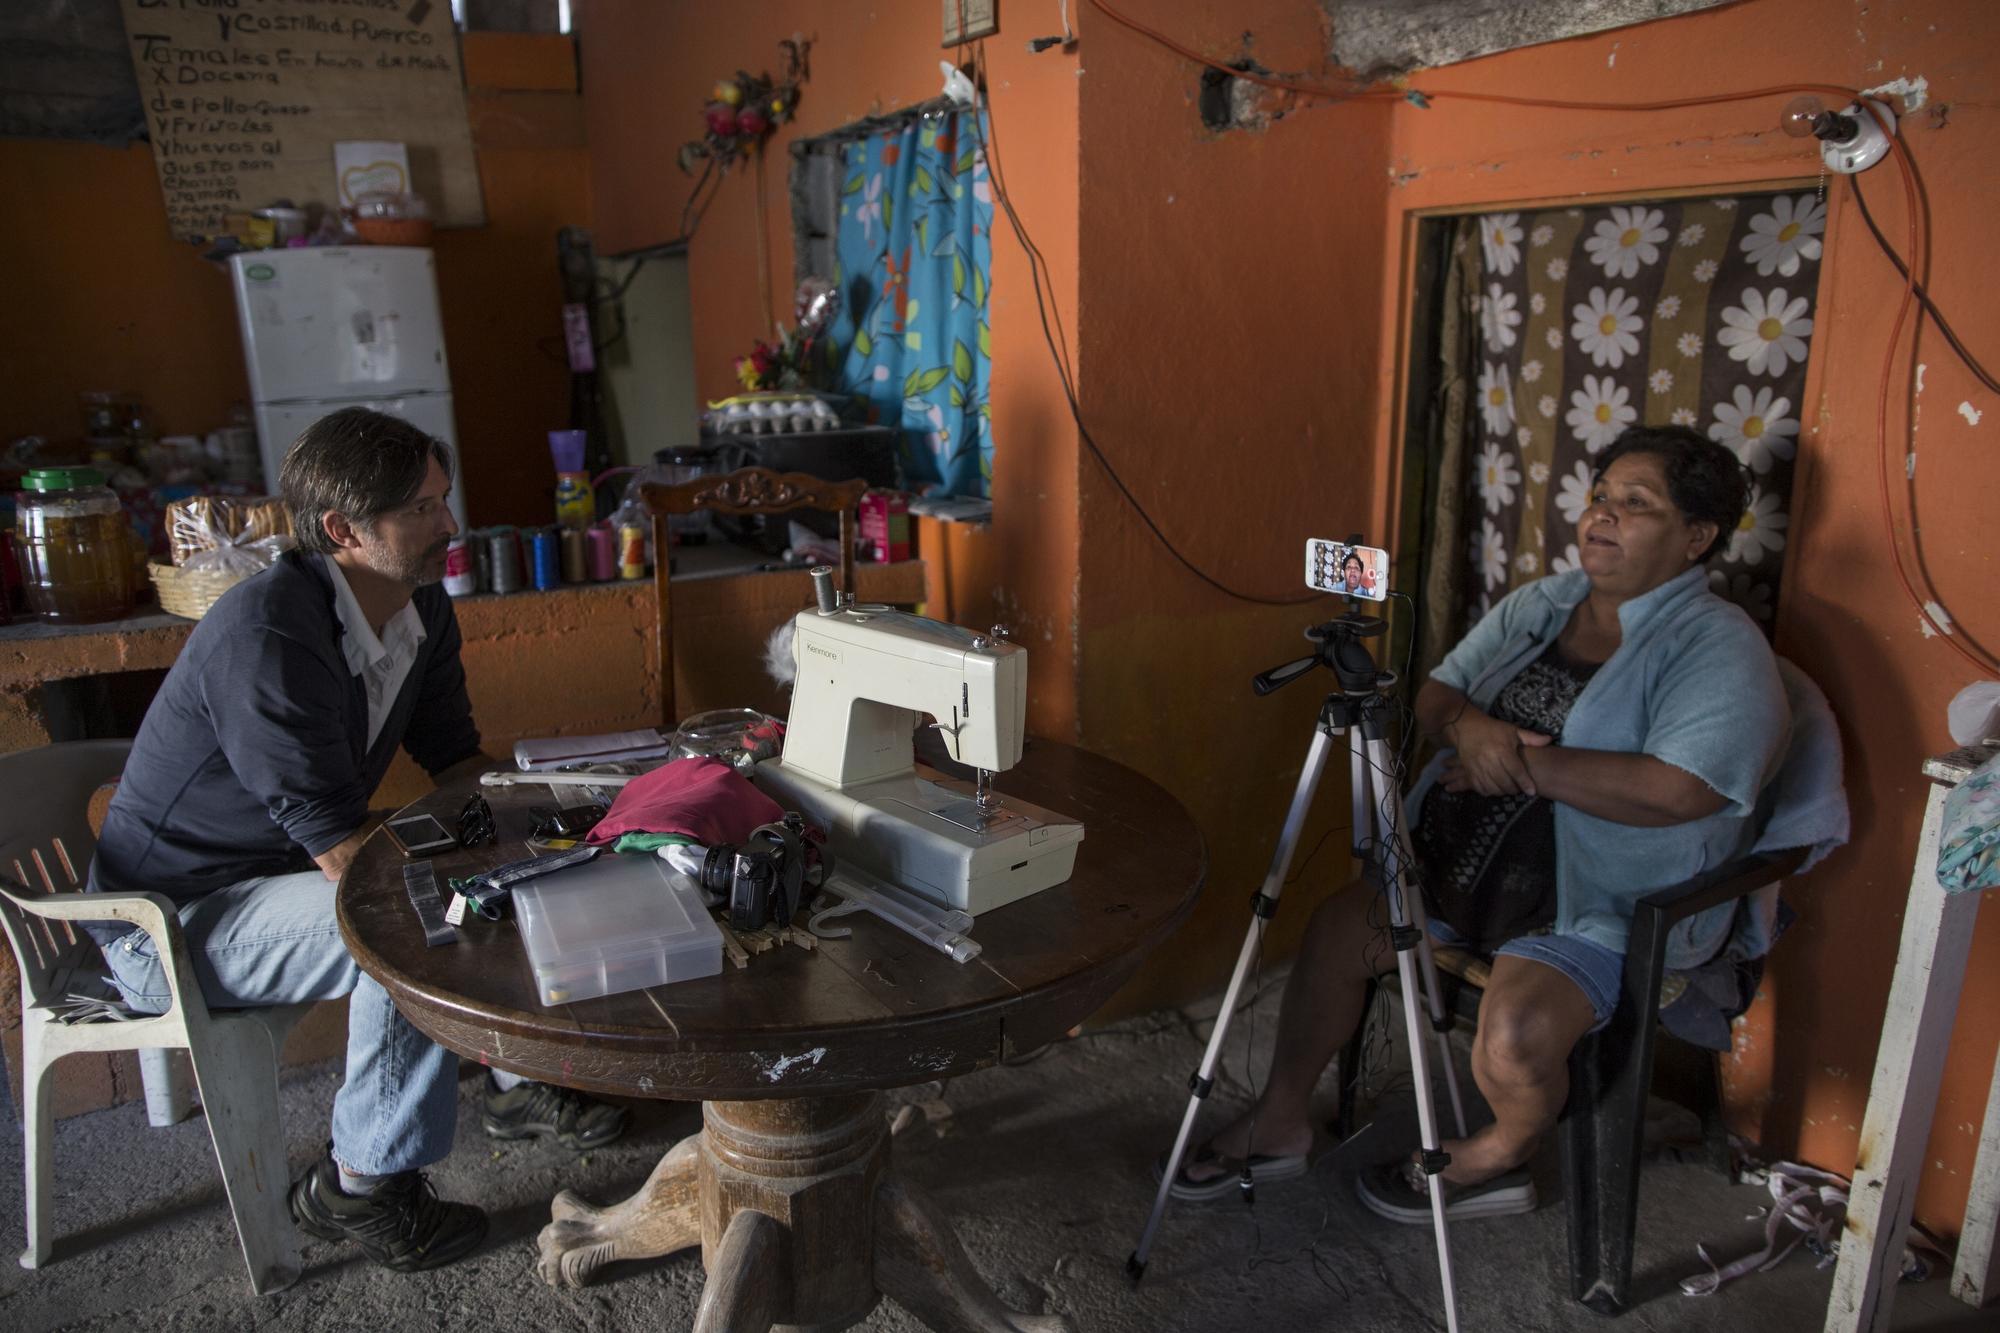 AP journalist Christopher Sherman interviews Jesus Esteban Cruz inside her home in Reynosa, Mexico, Wednesday, March 22, 2017, across the border from McAllen, Texas. (AP Photo/Rodrigo Abd)